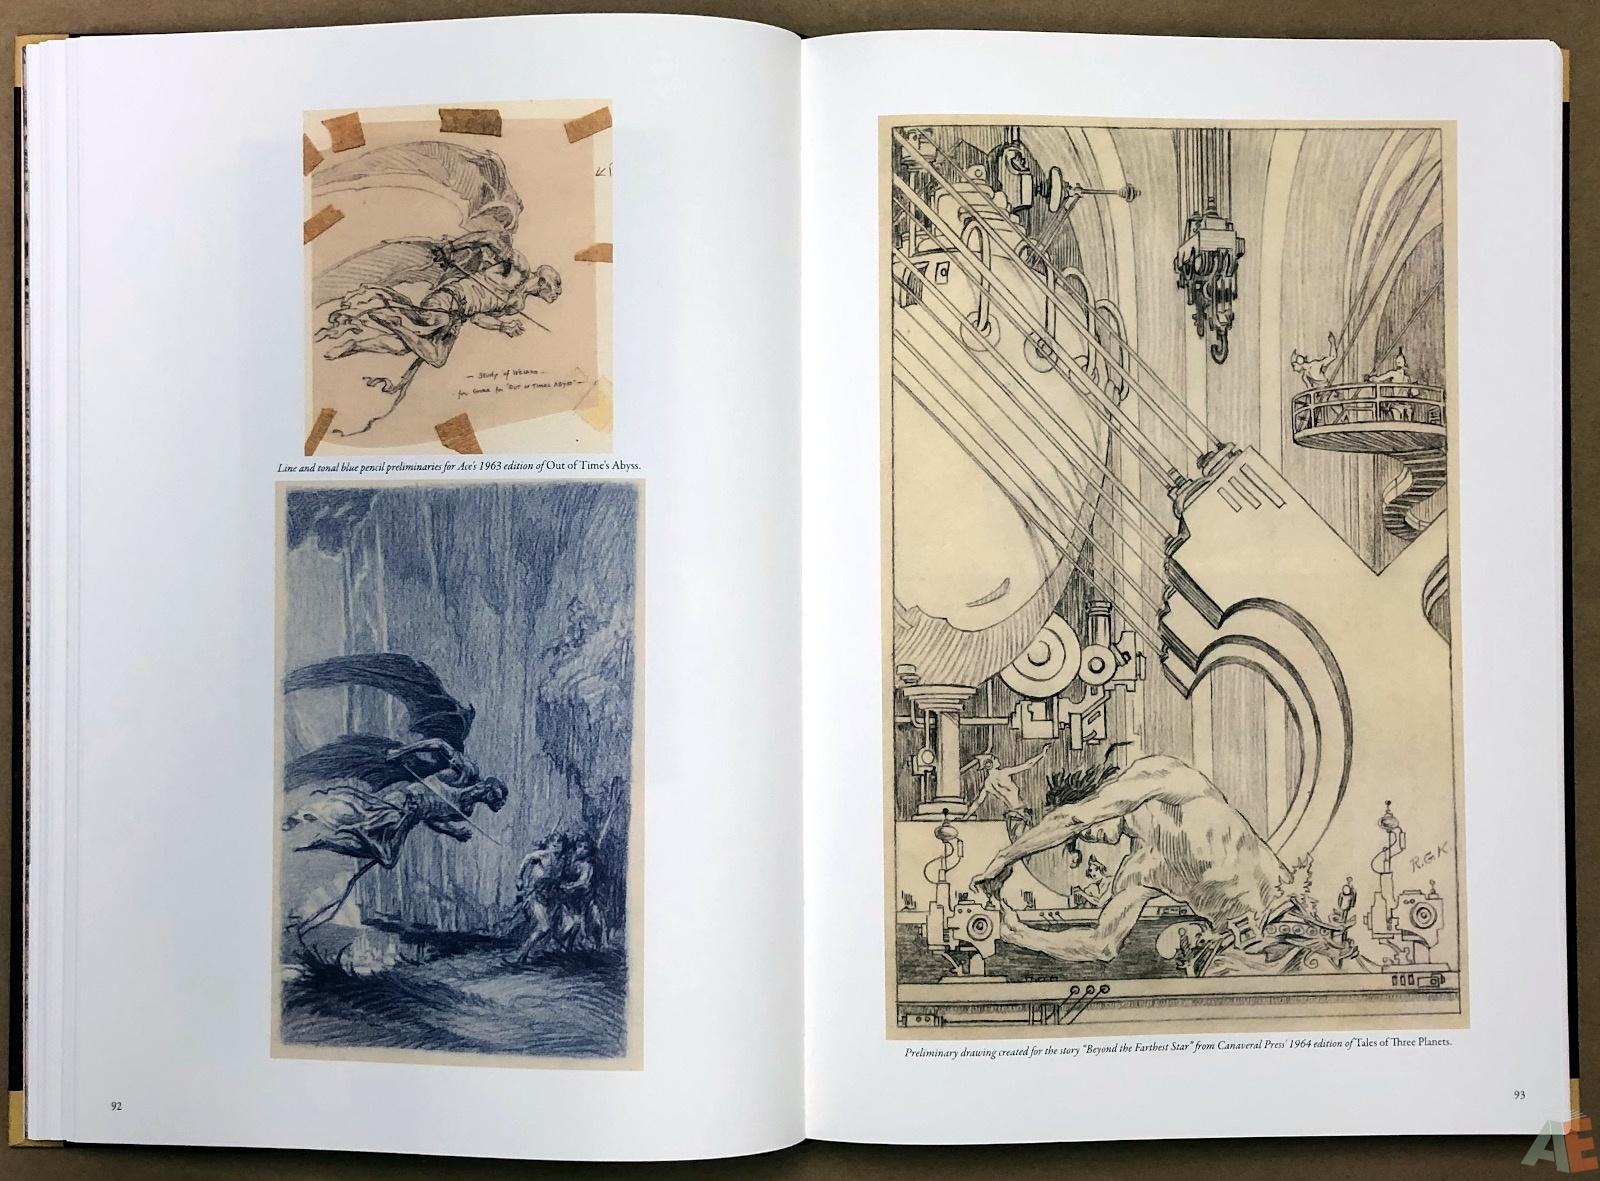 Roy G. Krenkel: Father of Heroic Fantasy - A Centennial Celebration 21